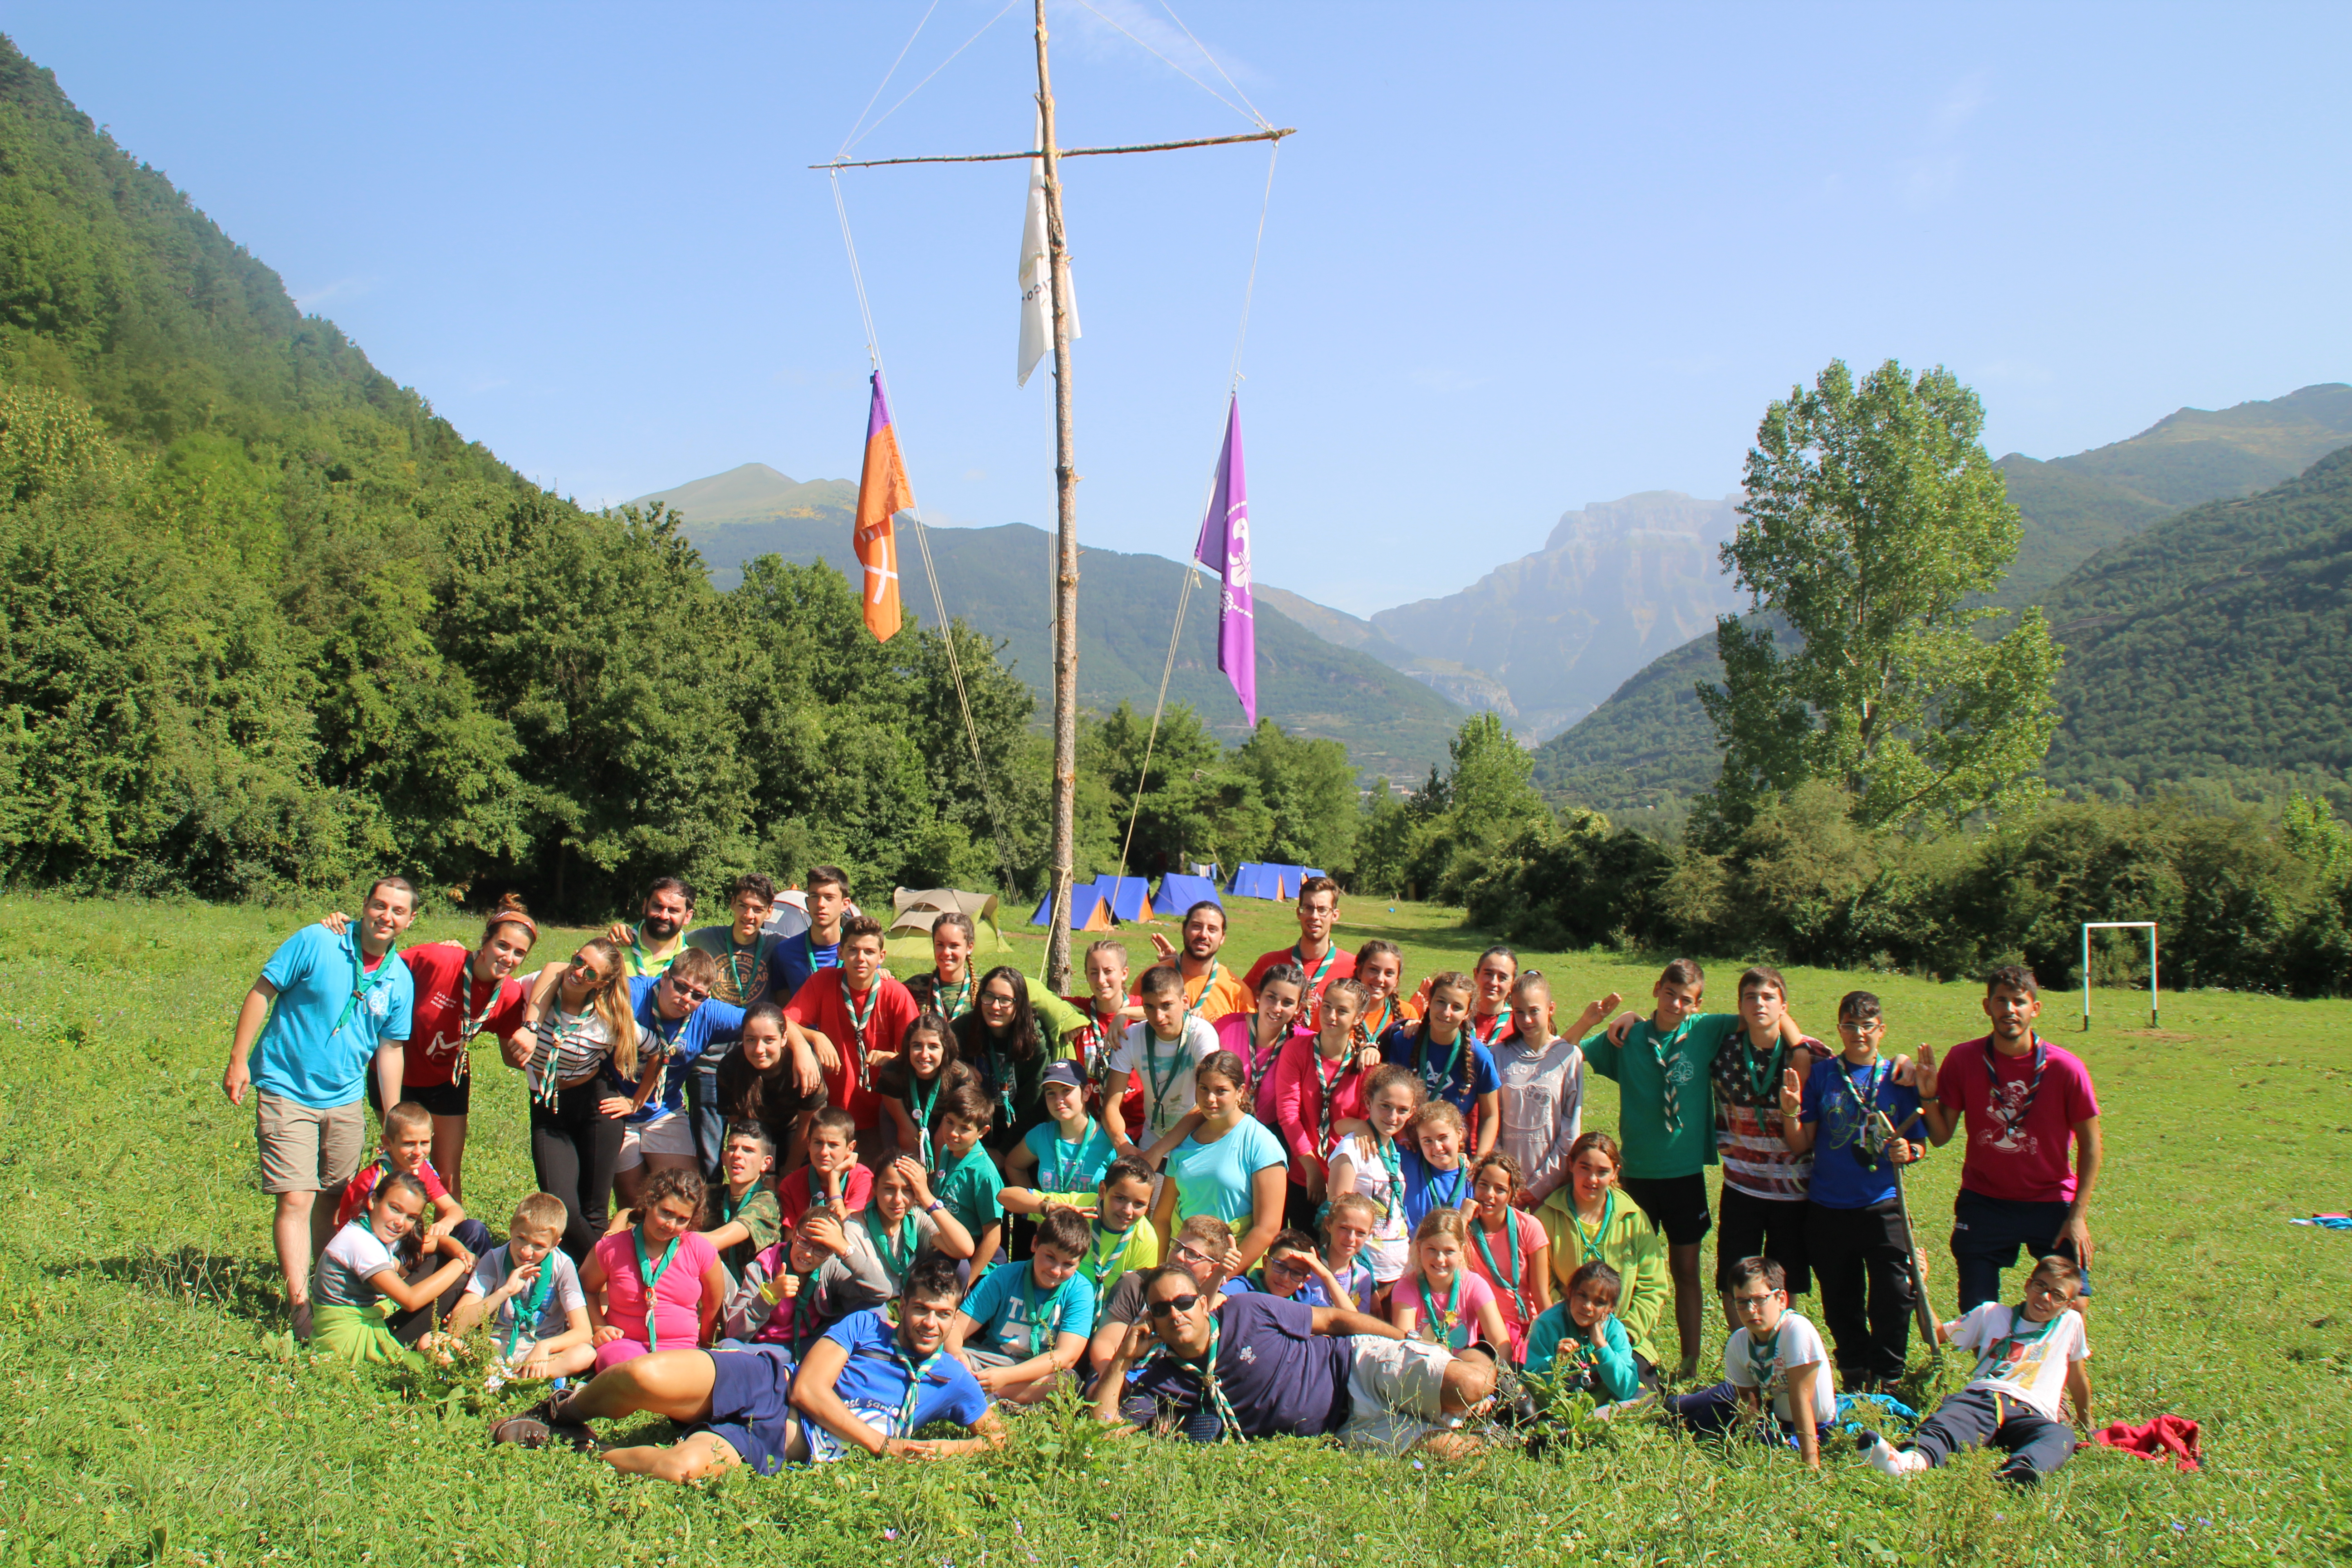 15-16 - Grupo - Campamento de verano - P176